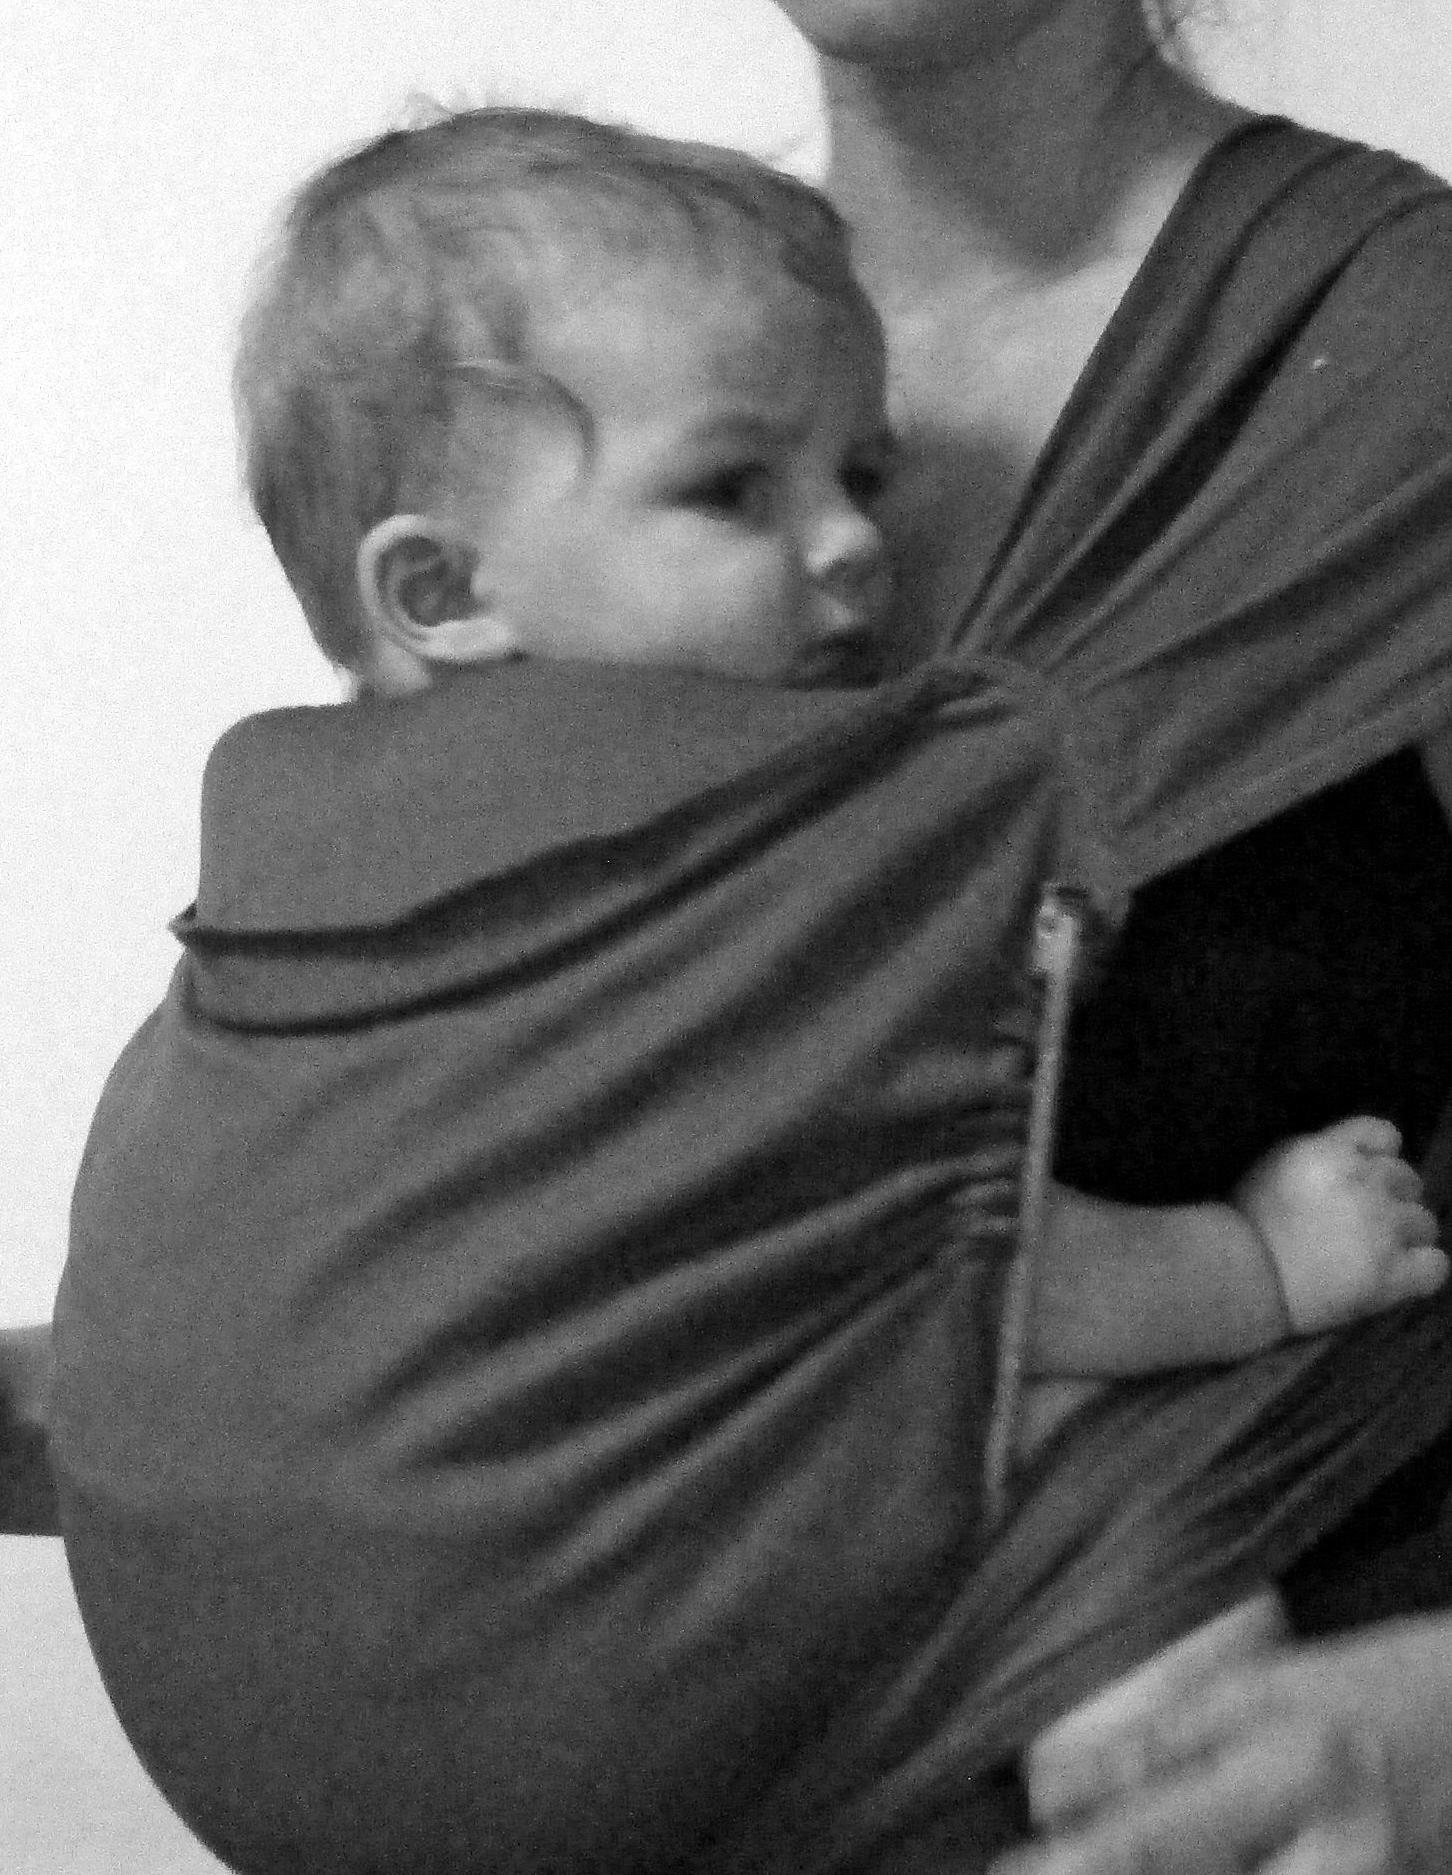 Un appui-tête modulable du Mid-Tai ici avec un petit bébé